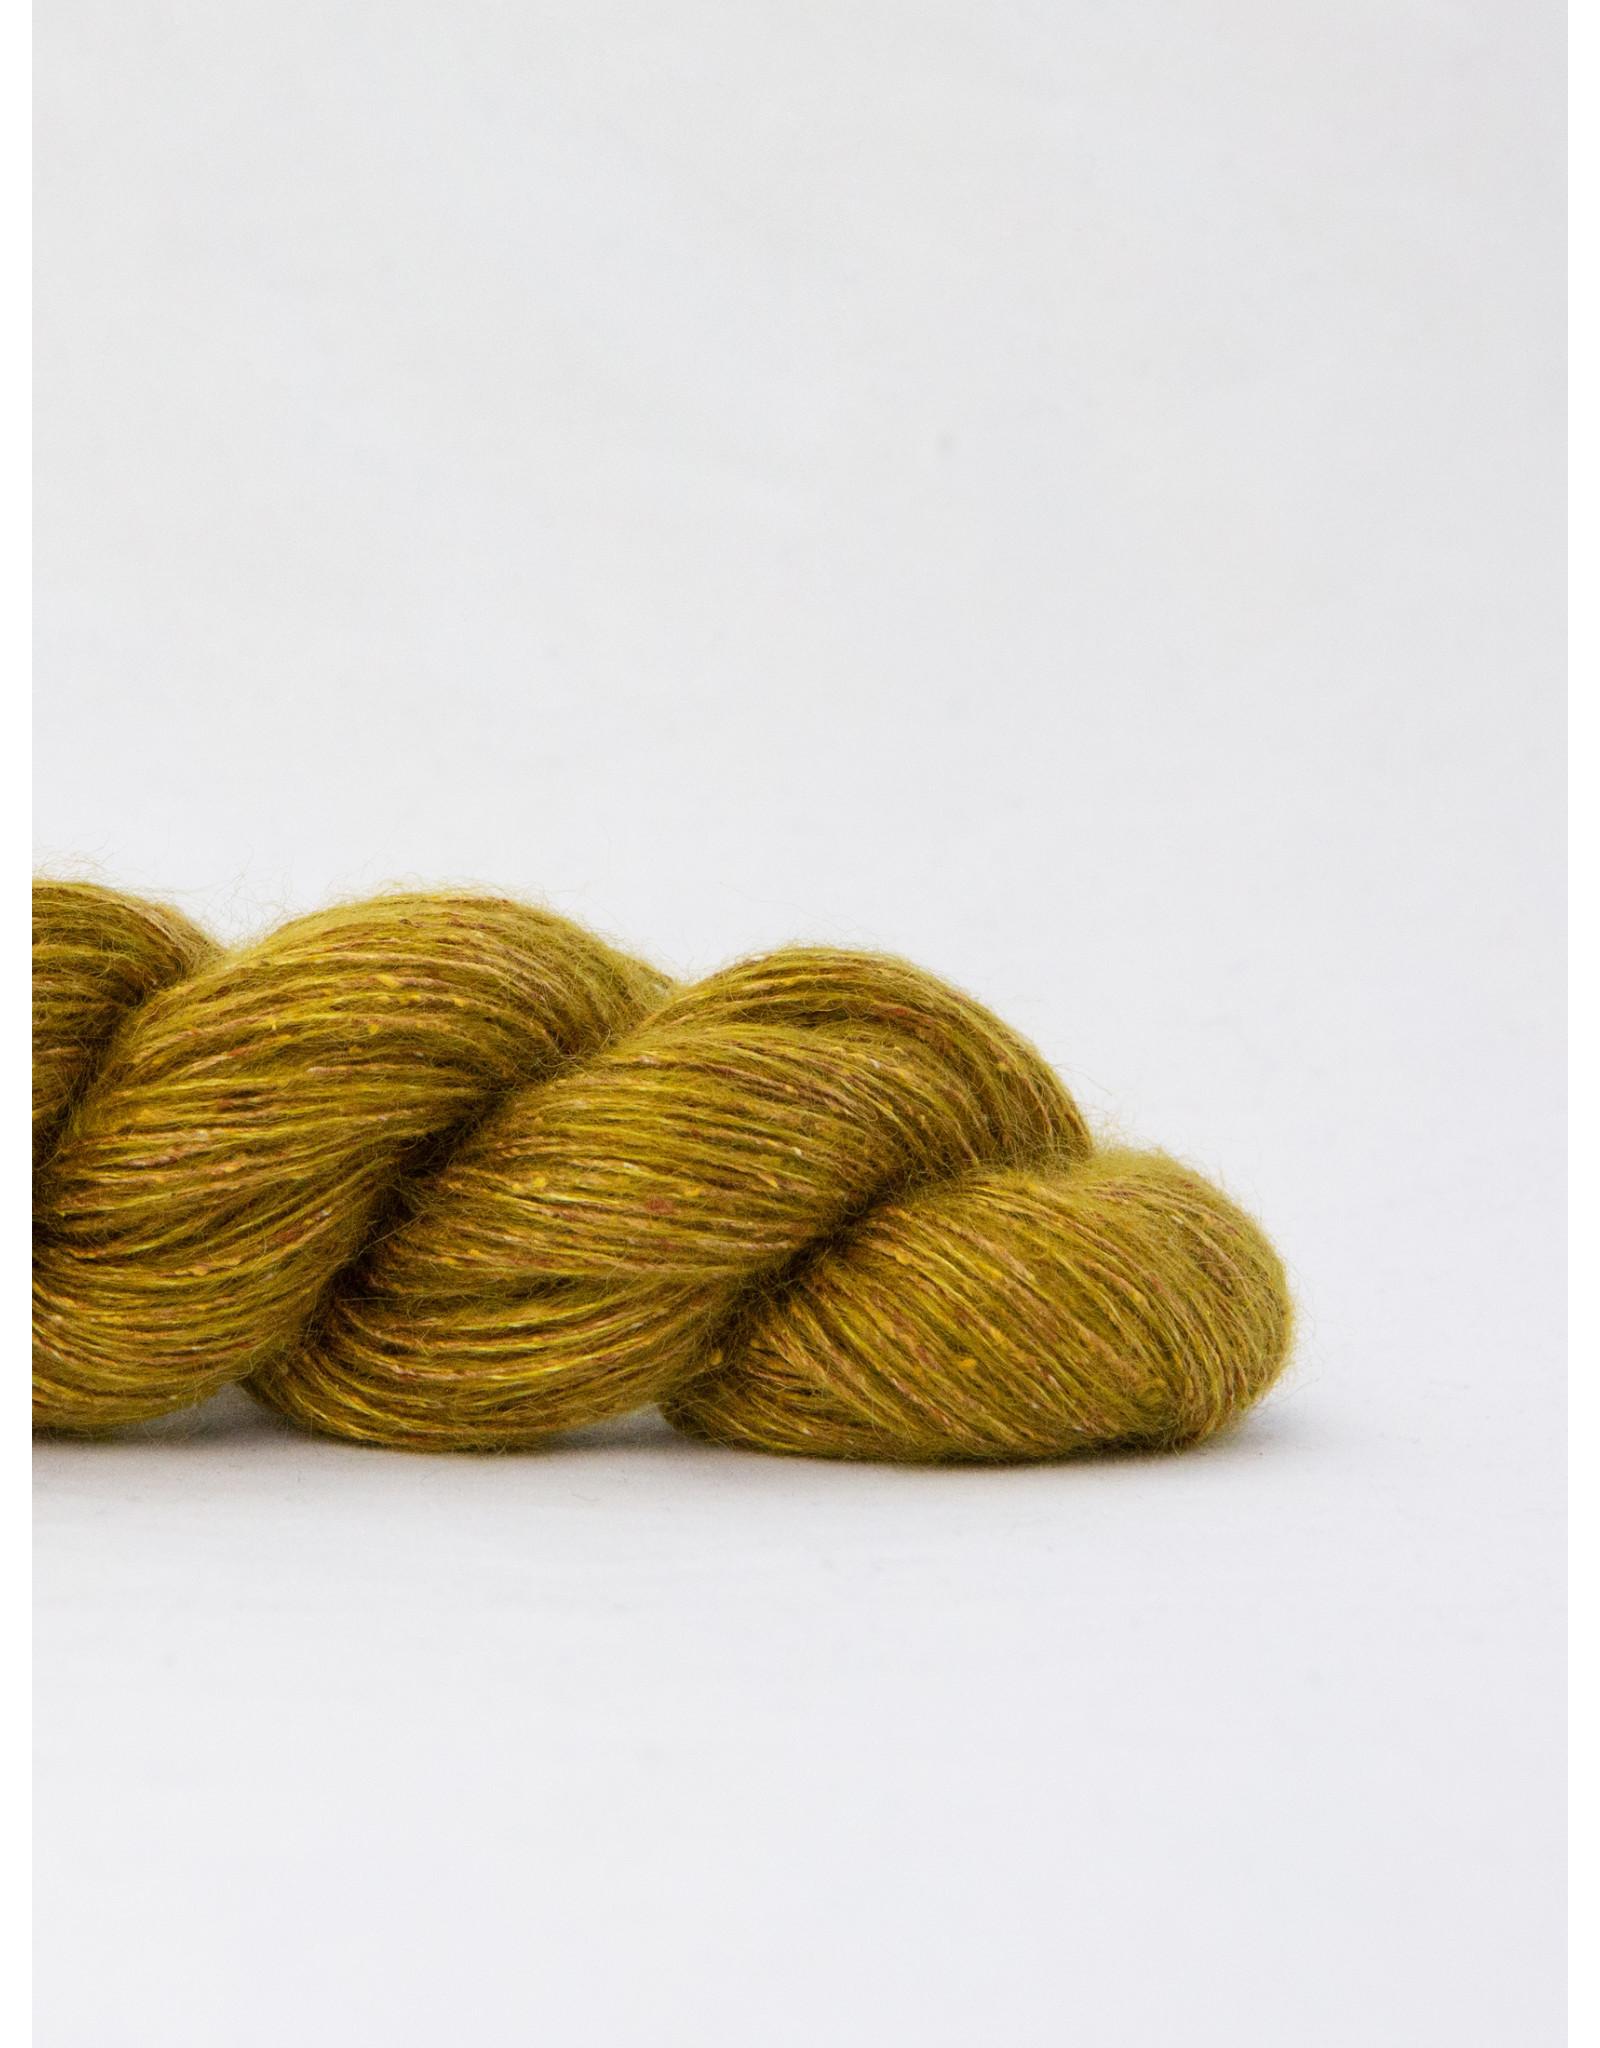 Shibui Tweed Silk Cloud van Shibui Knits - 174 m - 25 g